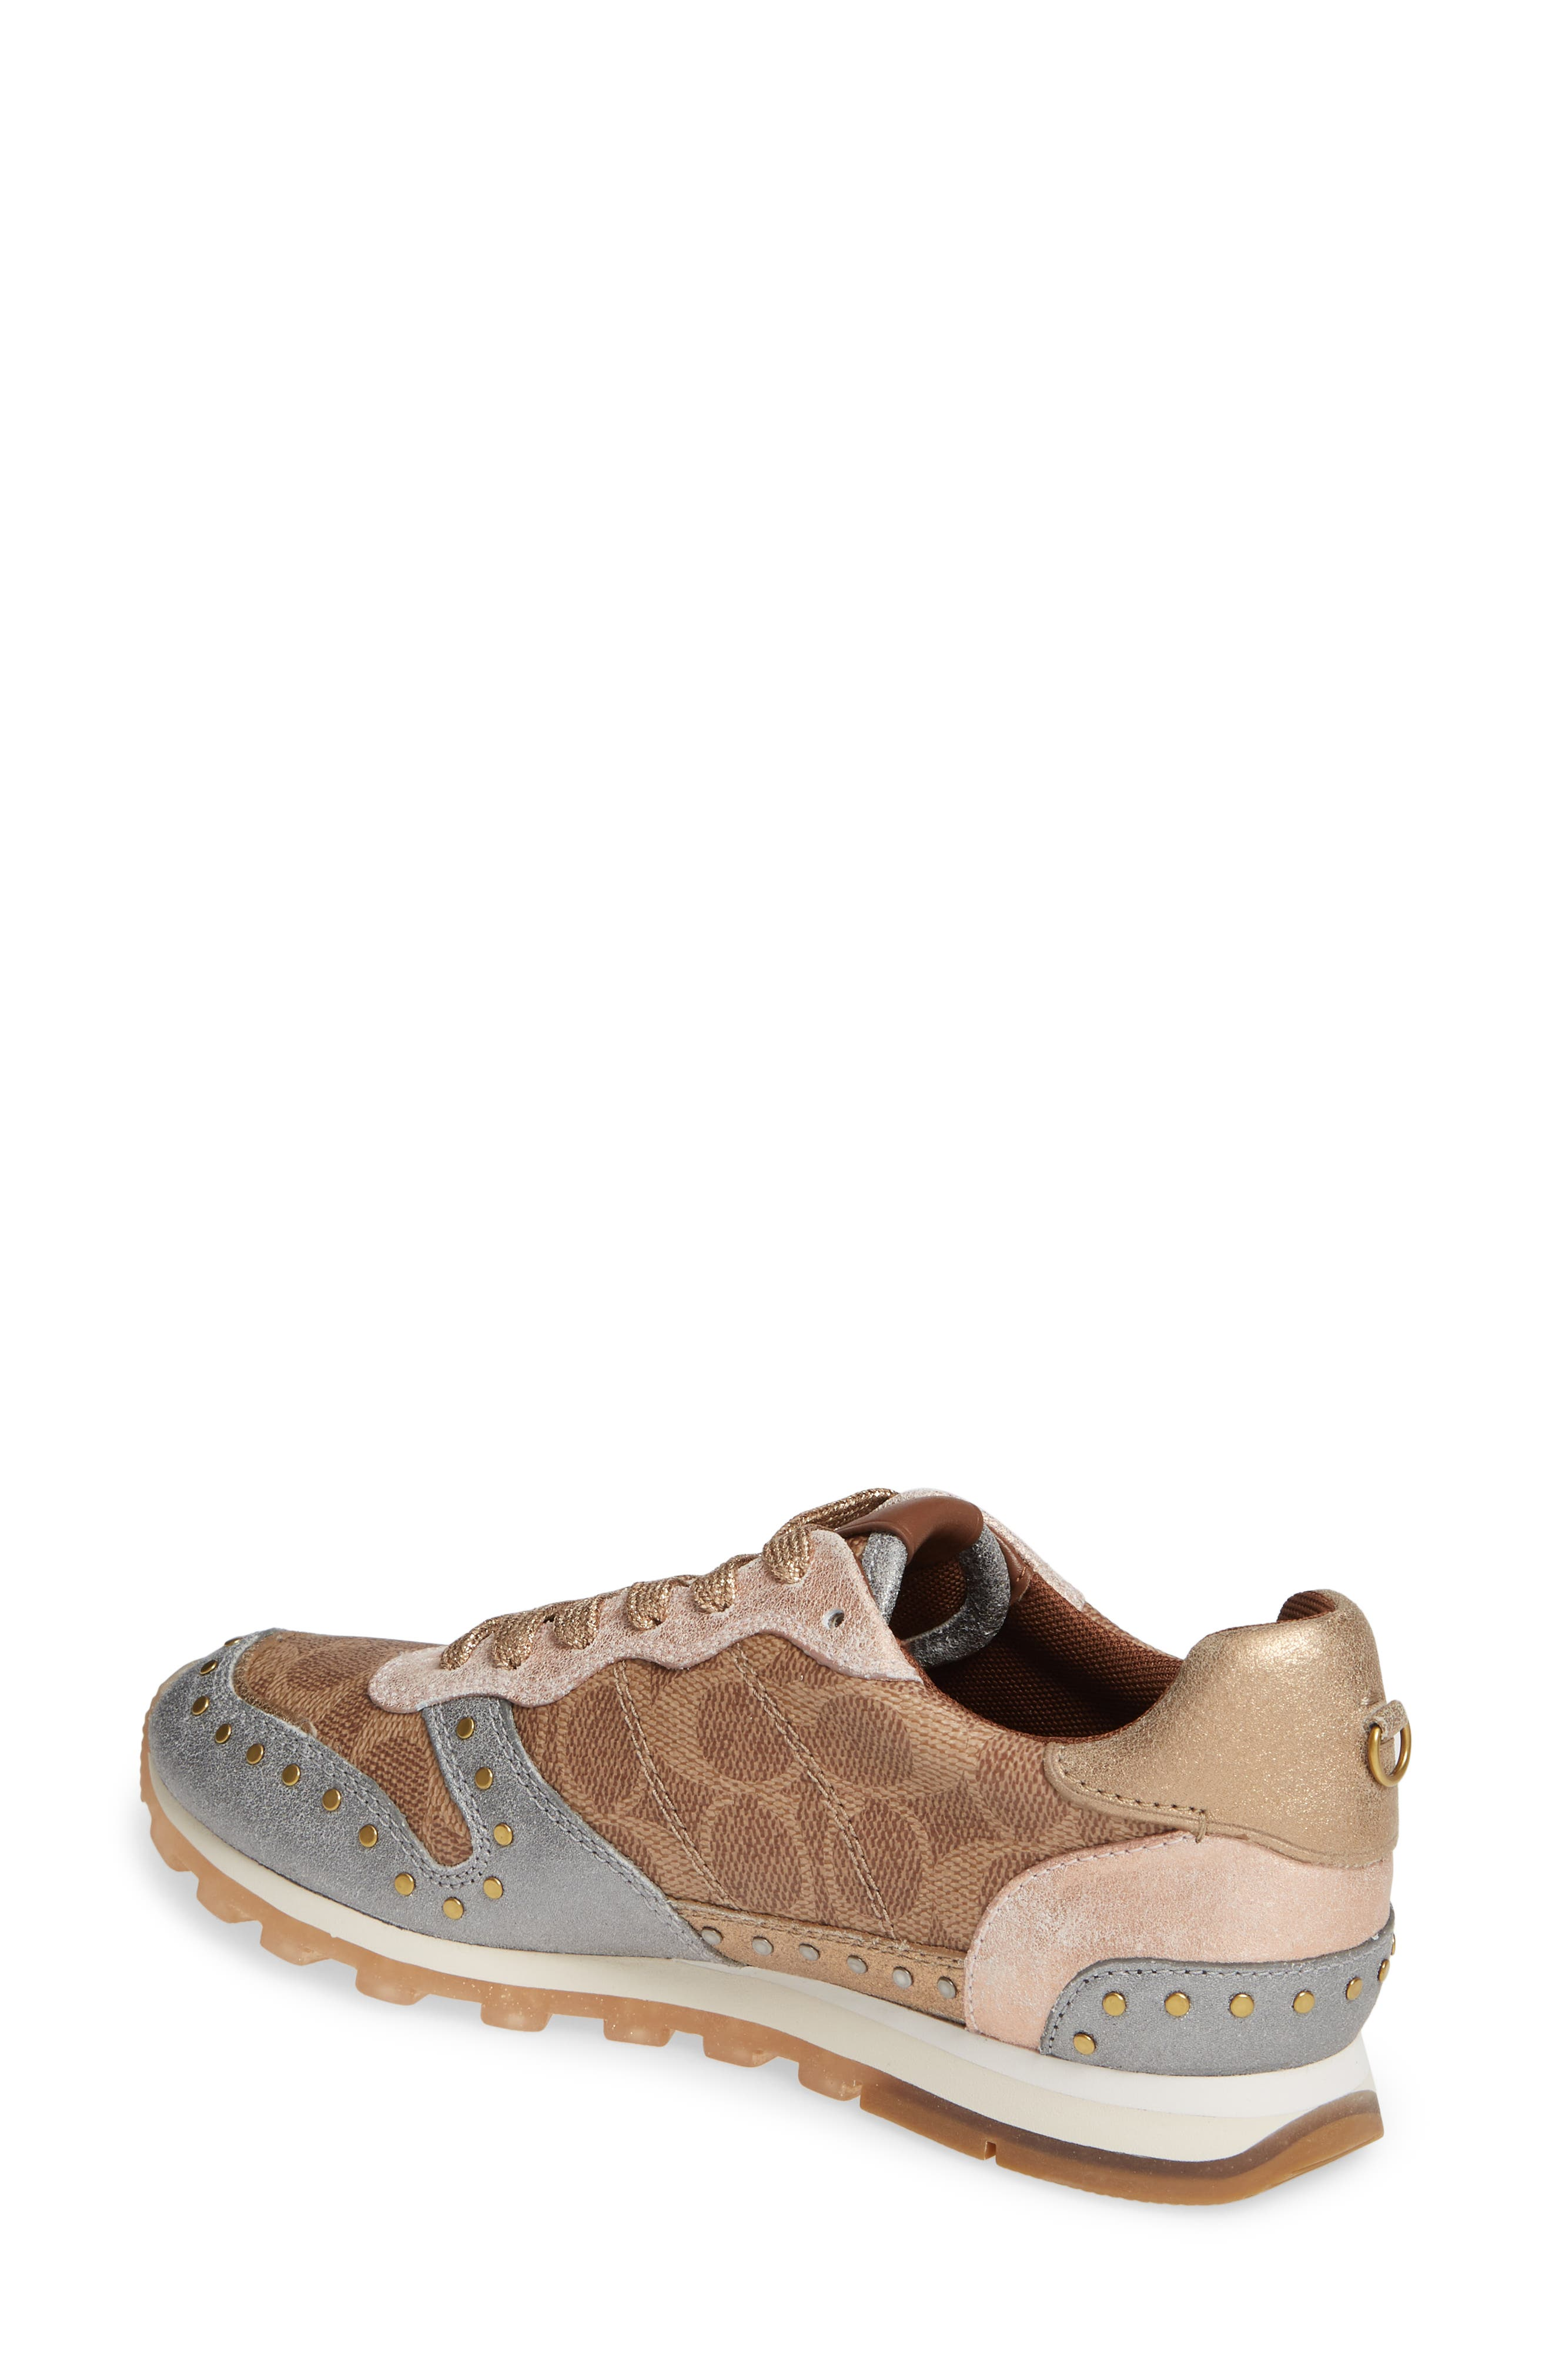 COACH, C118 Studded Sneaker, Alternate thumbnail 2, color, TAN/ GOLD MULTI